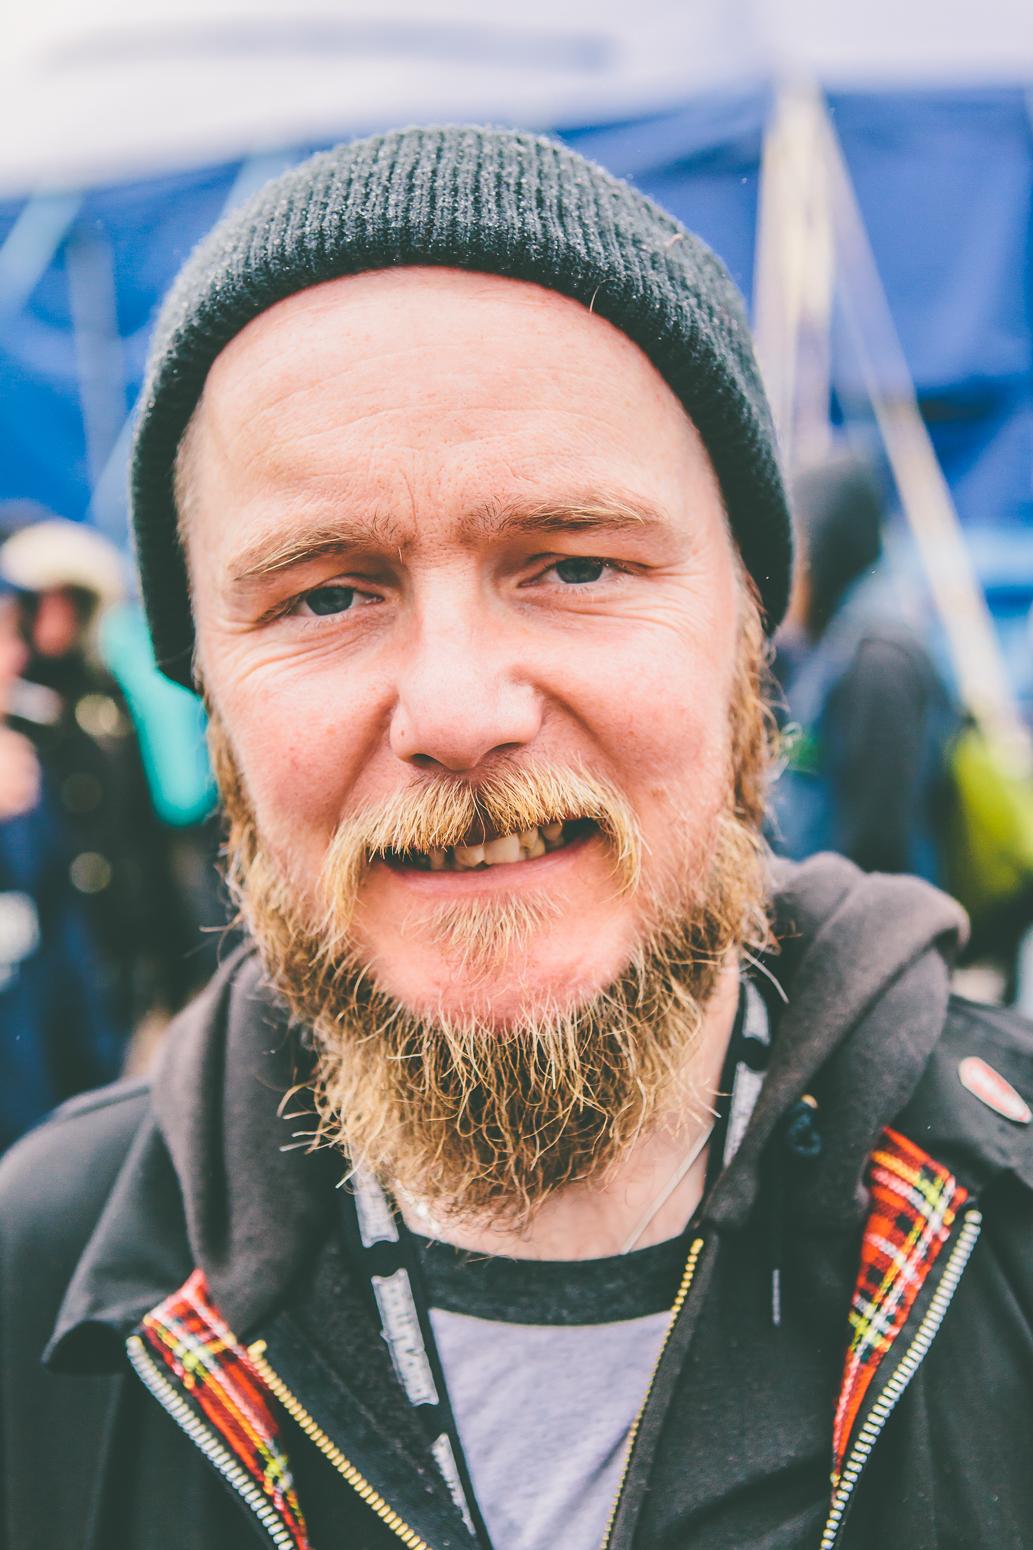 DL beards-9.jpg